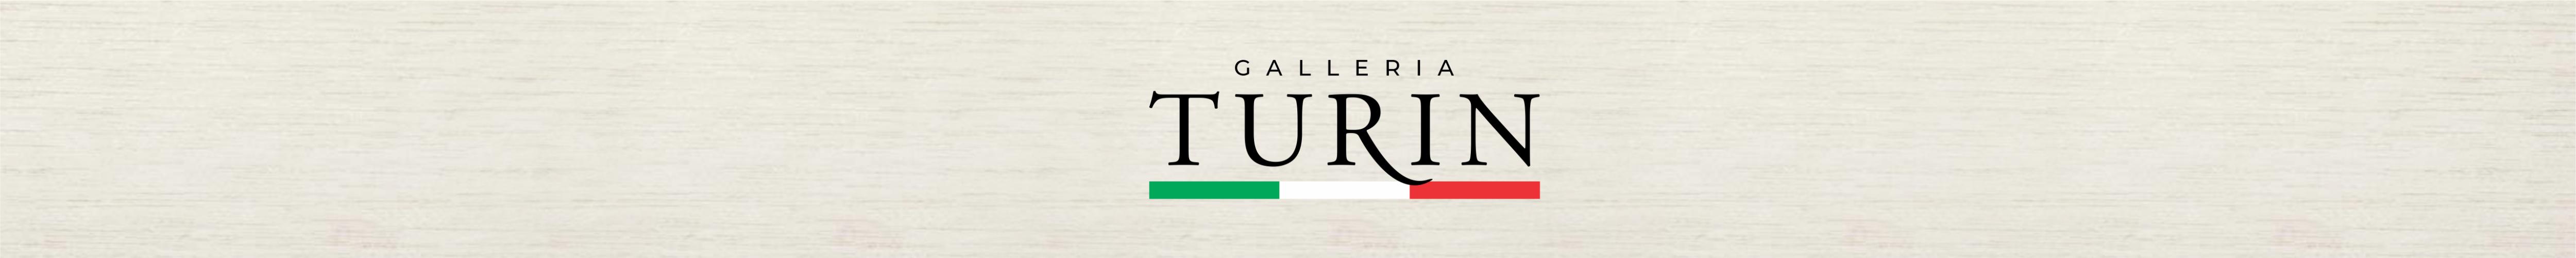 GALLERIA - TORRE TURIN